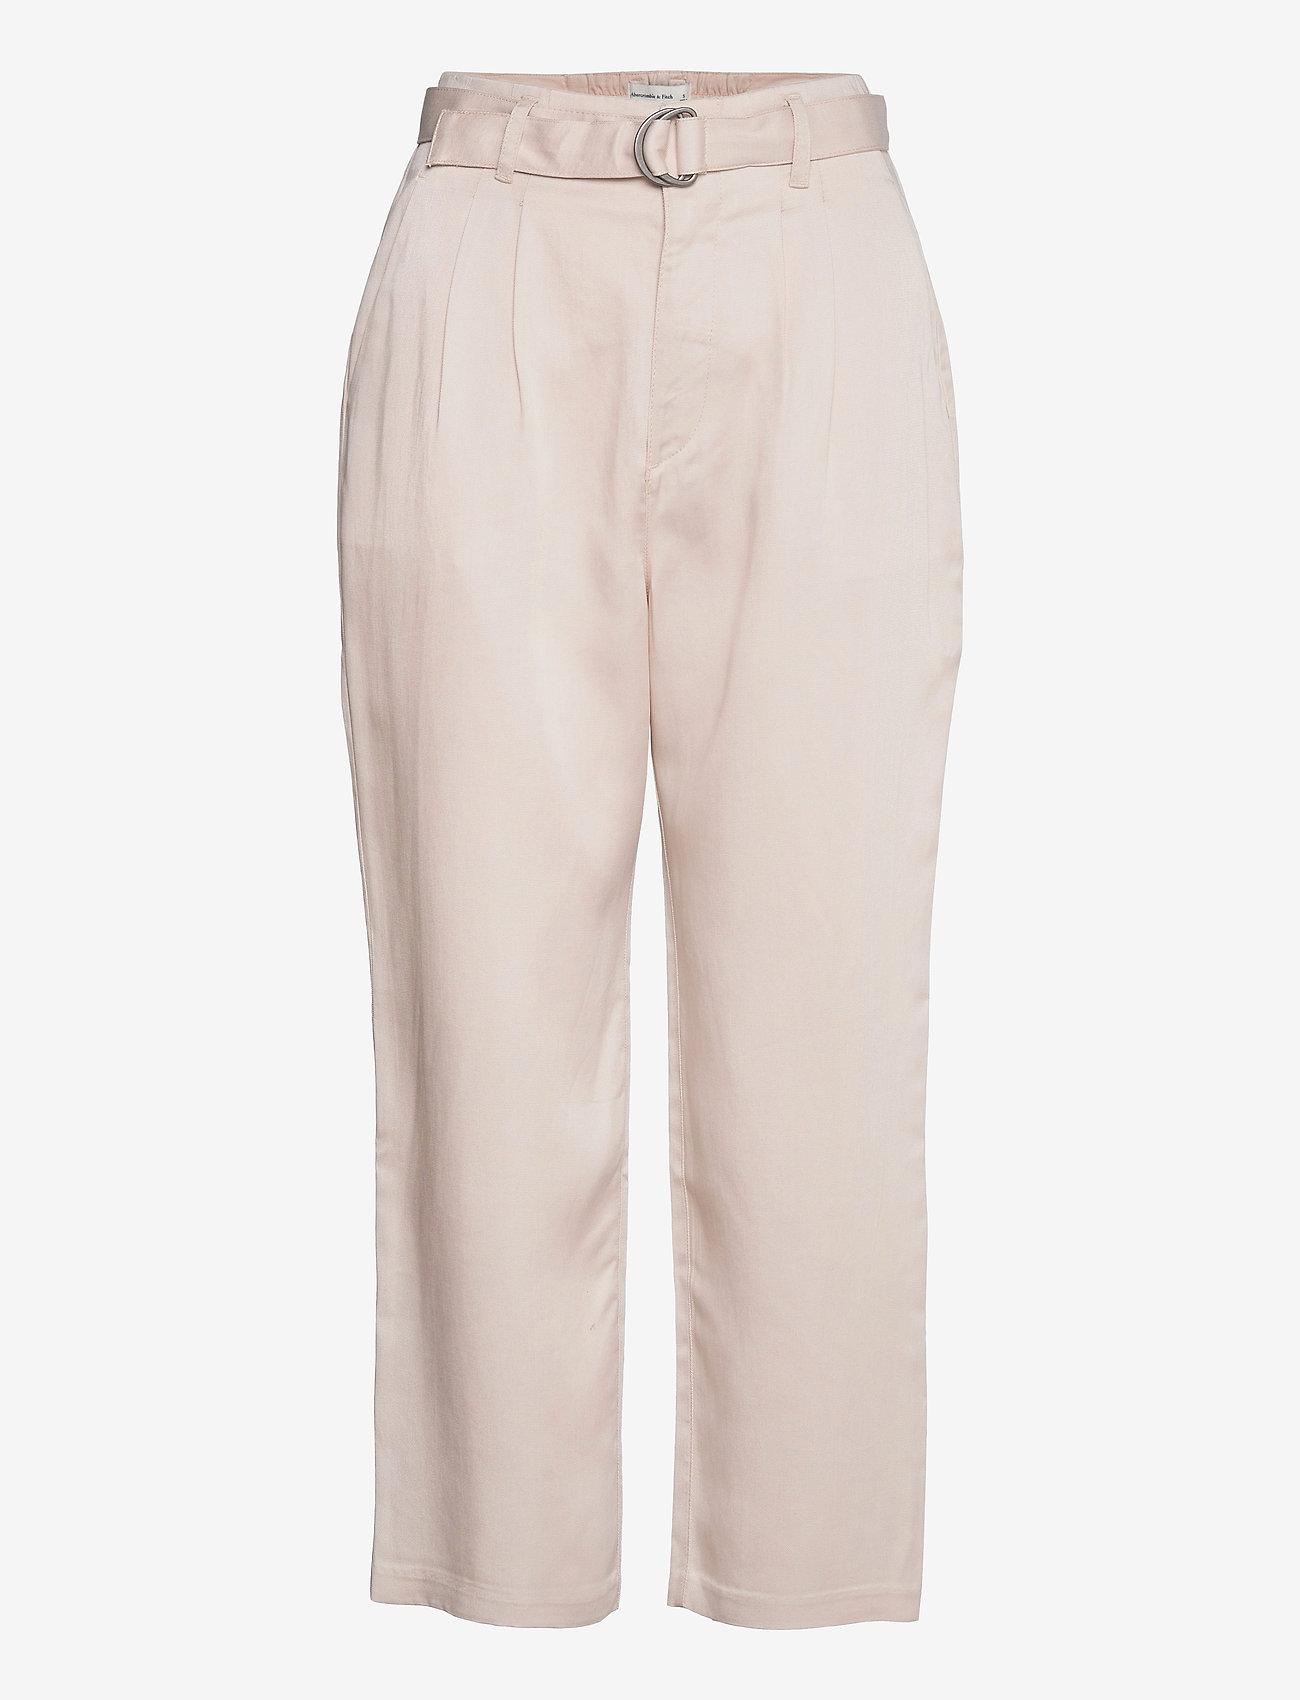 Abercrombie & Fitch - ANF WOMENS PANTS - bukser med lige ben - moonbeam - 0